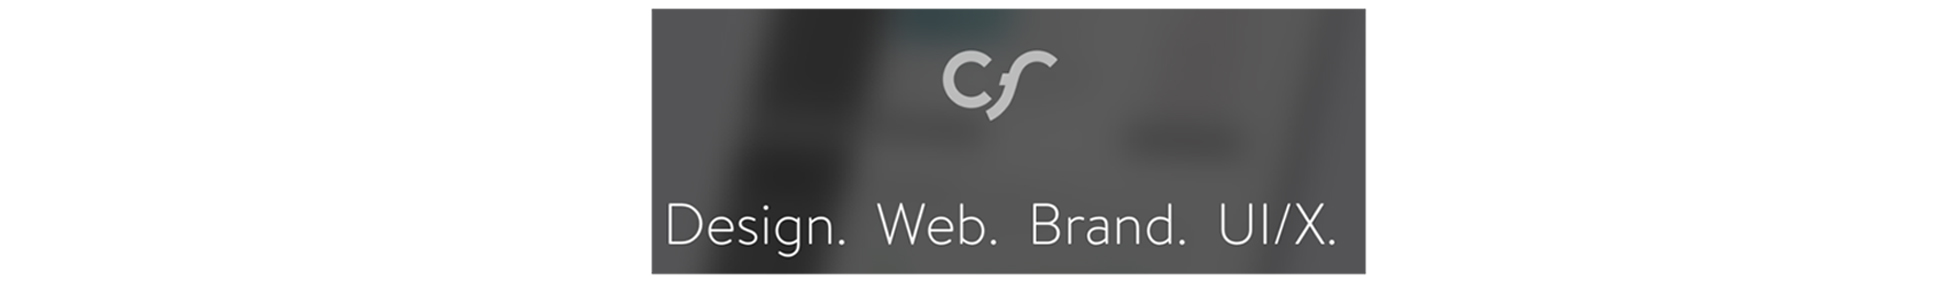 cubicflow logo.jpg